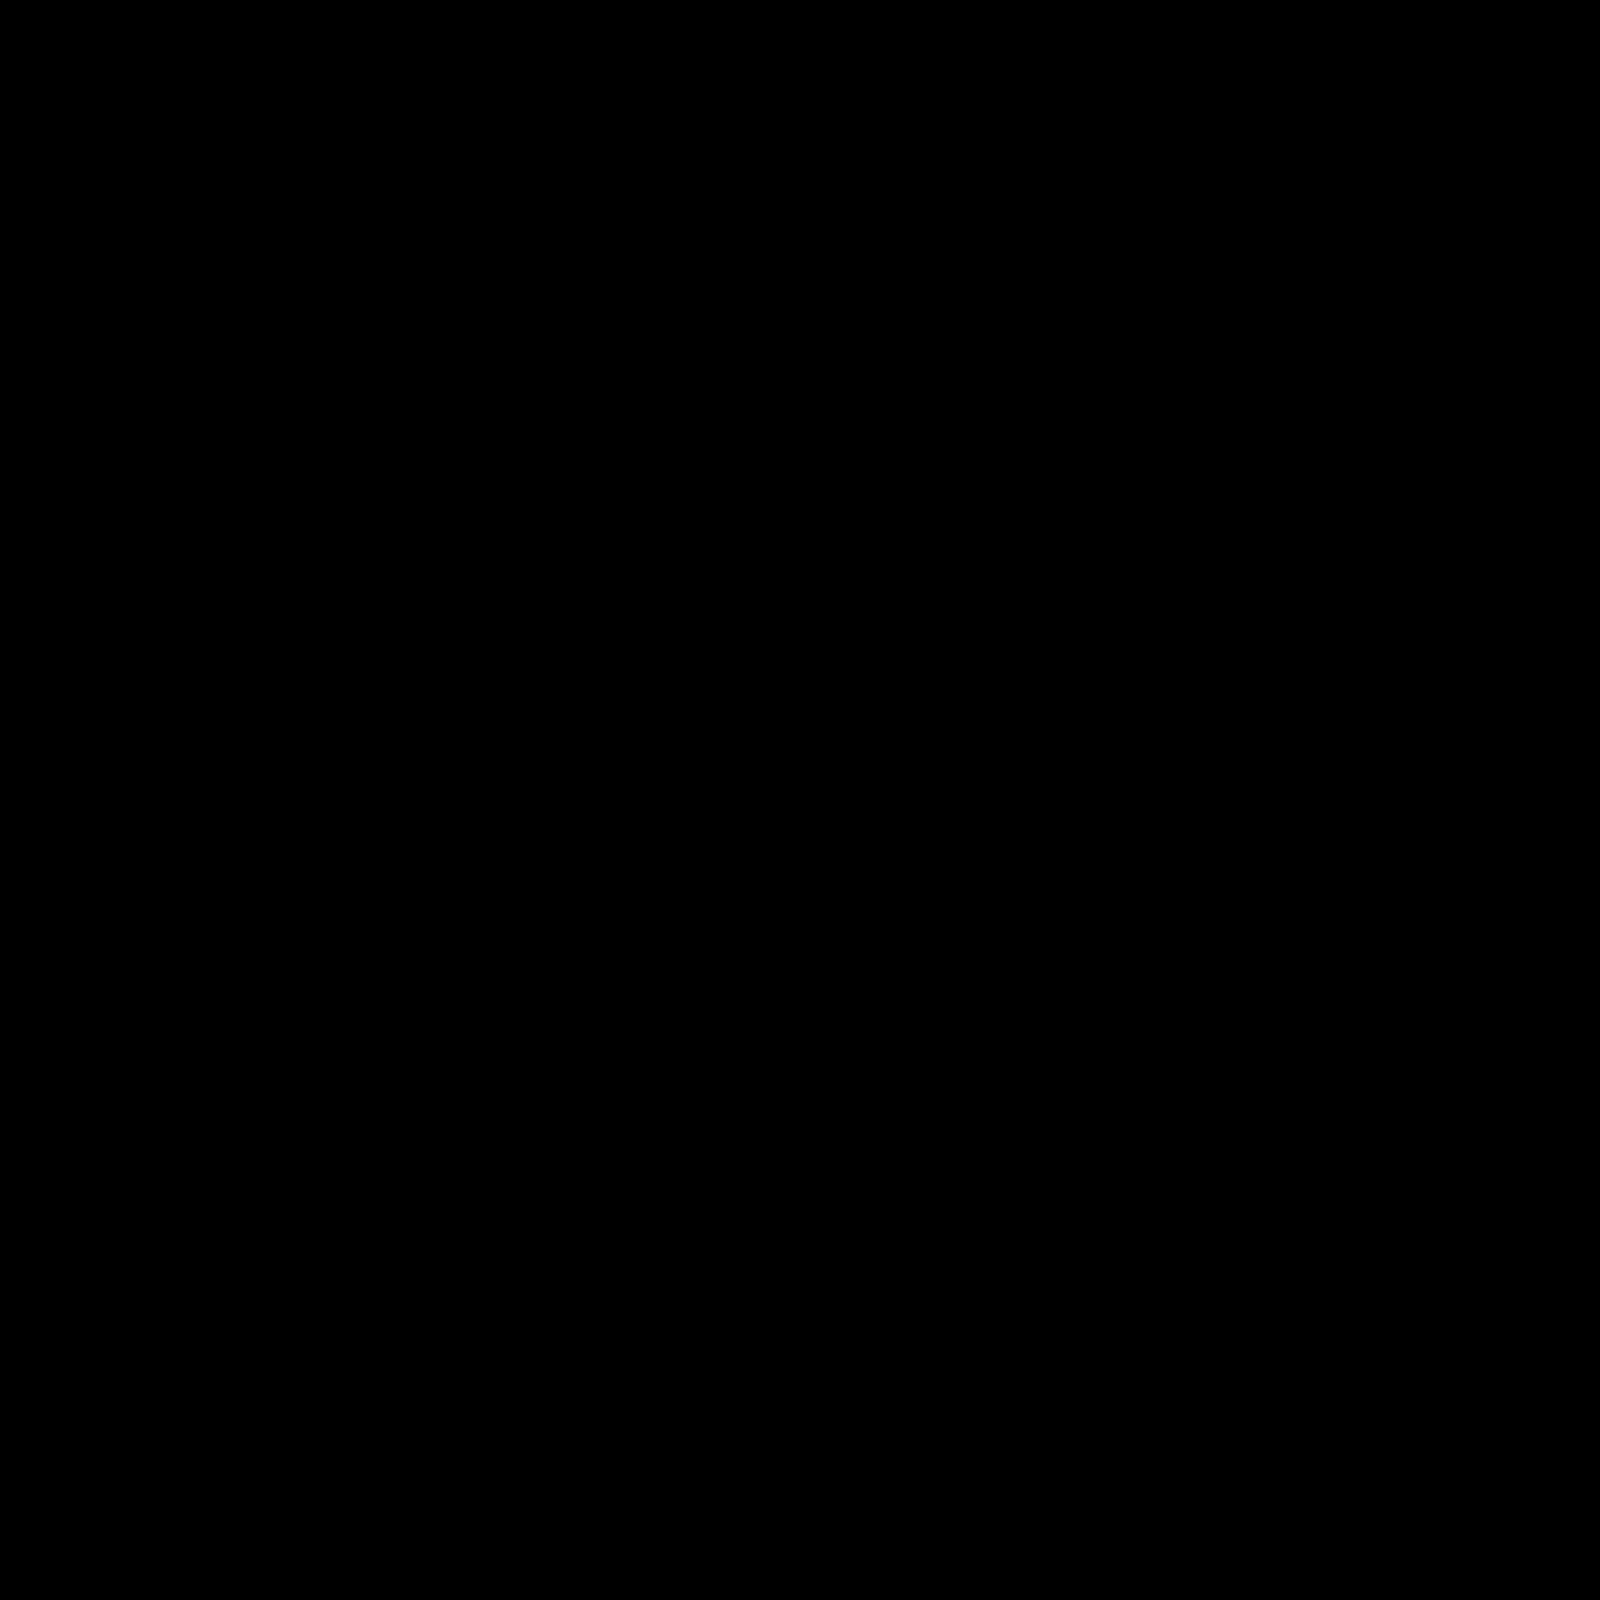 Sad Emoji Vector